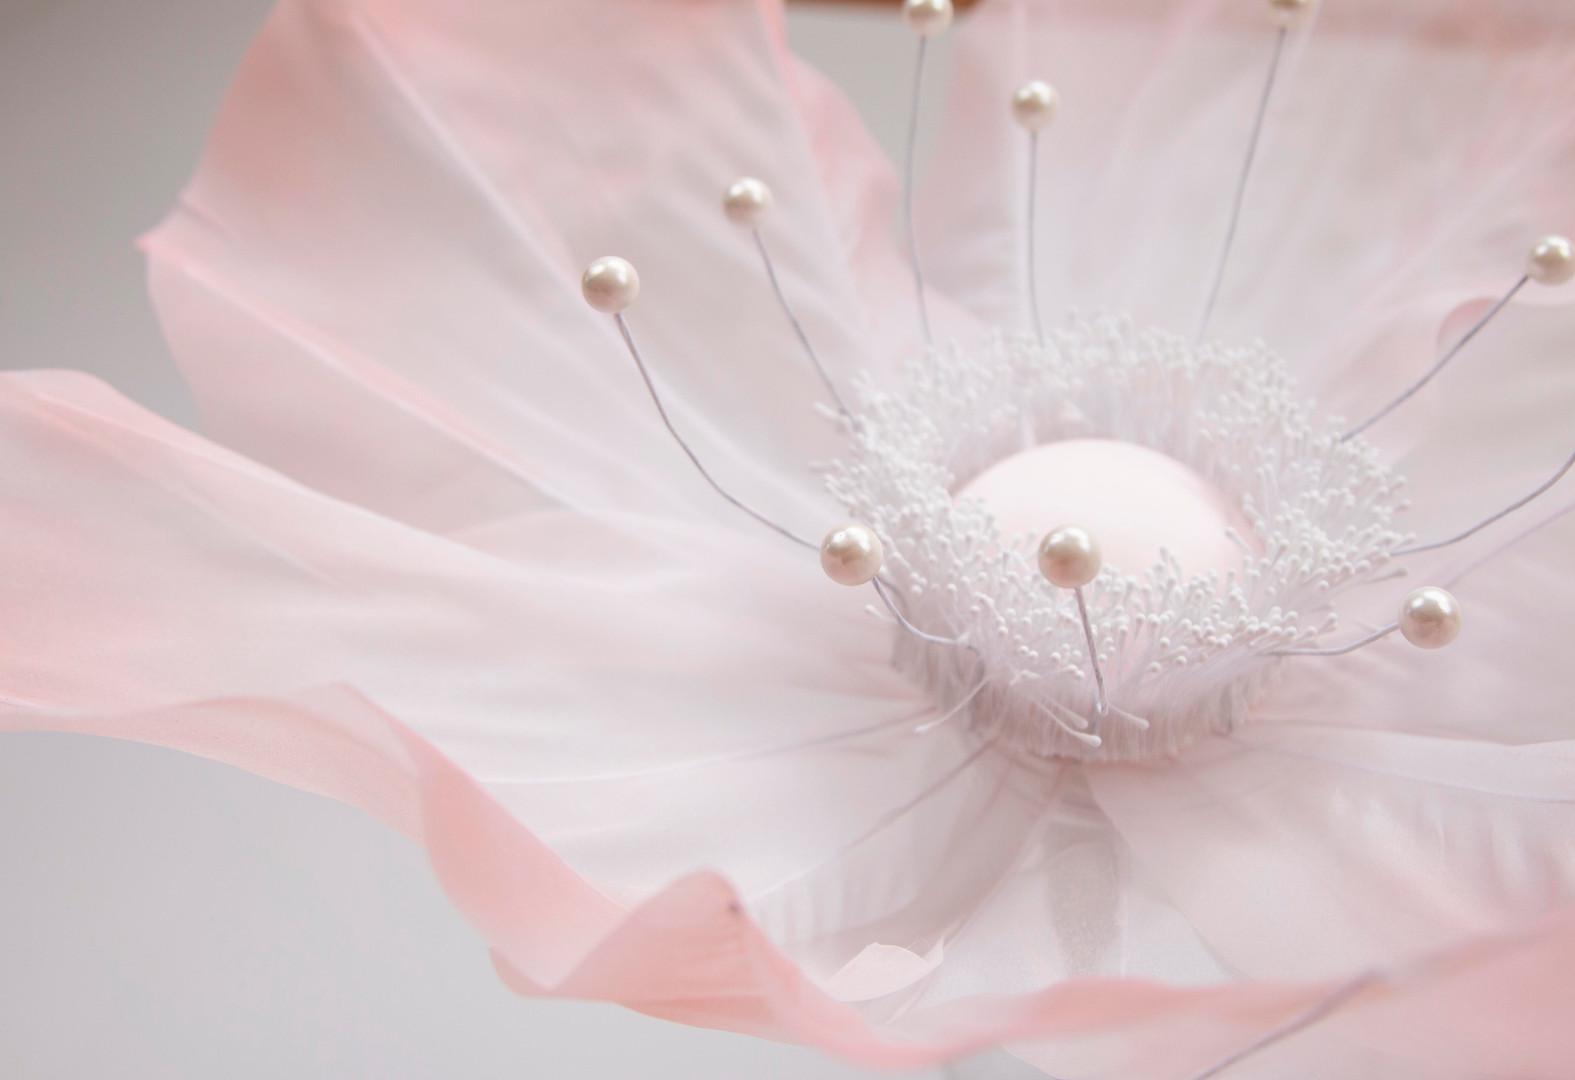 Anemone-Sheer-Blush-2.jpg